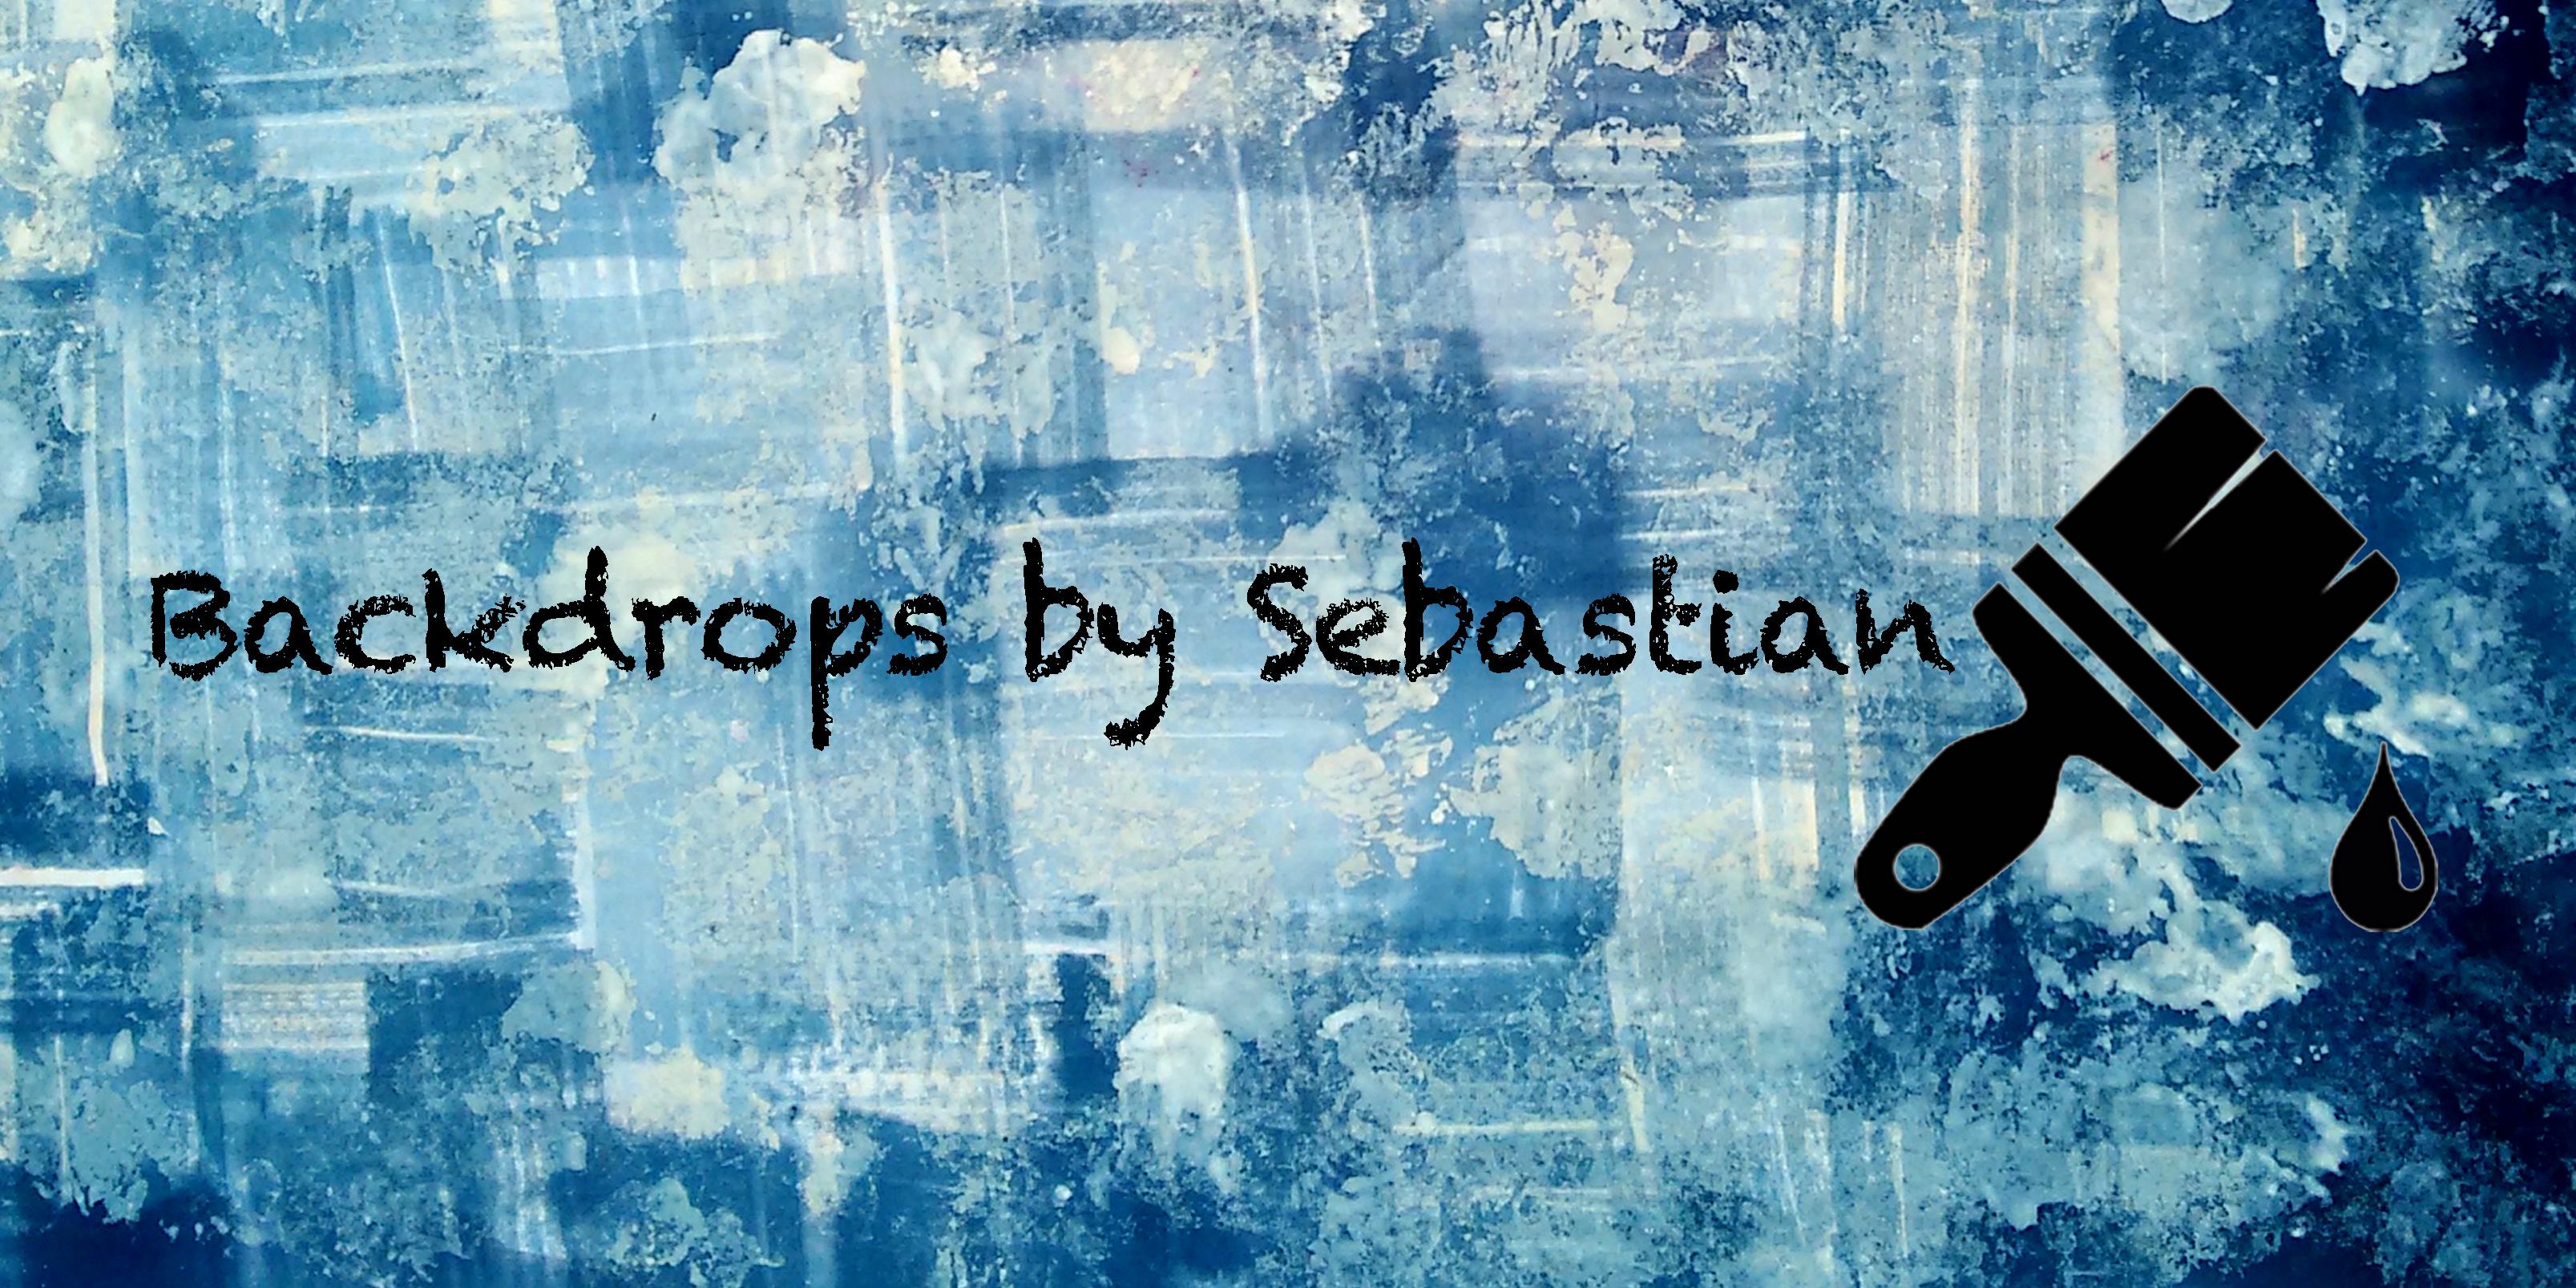 Backdrops by Sebastian